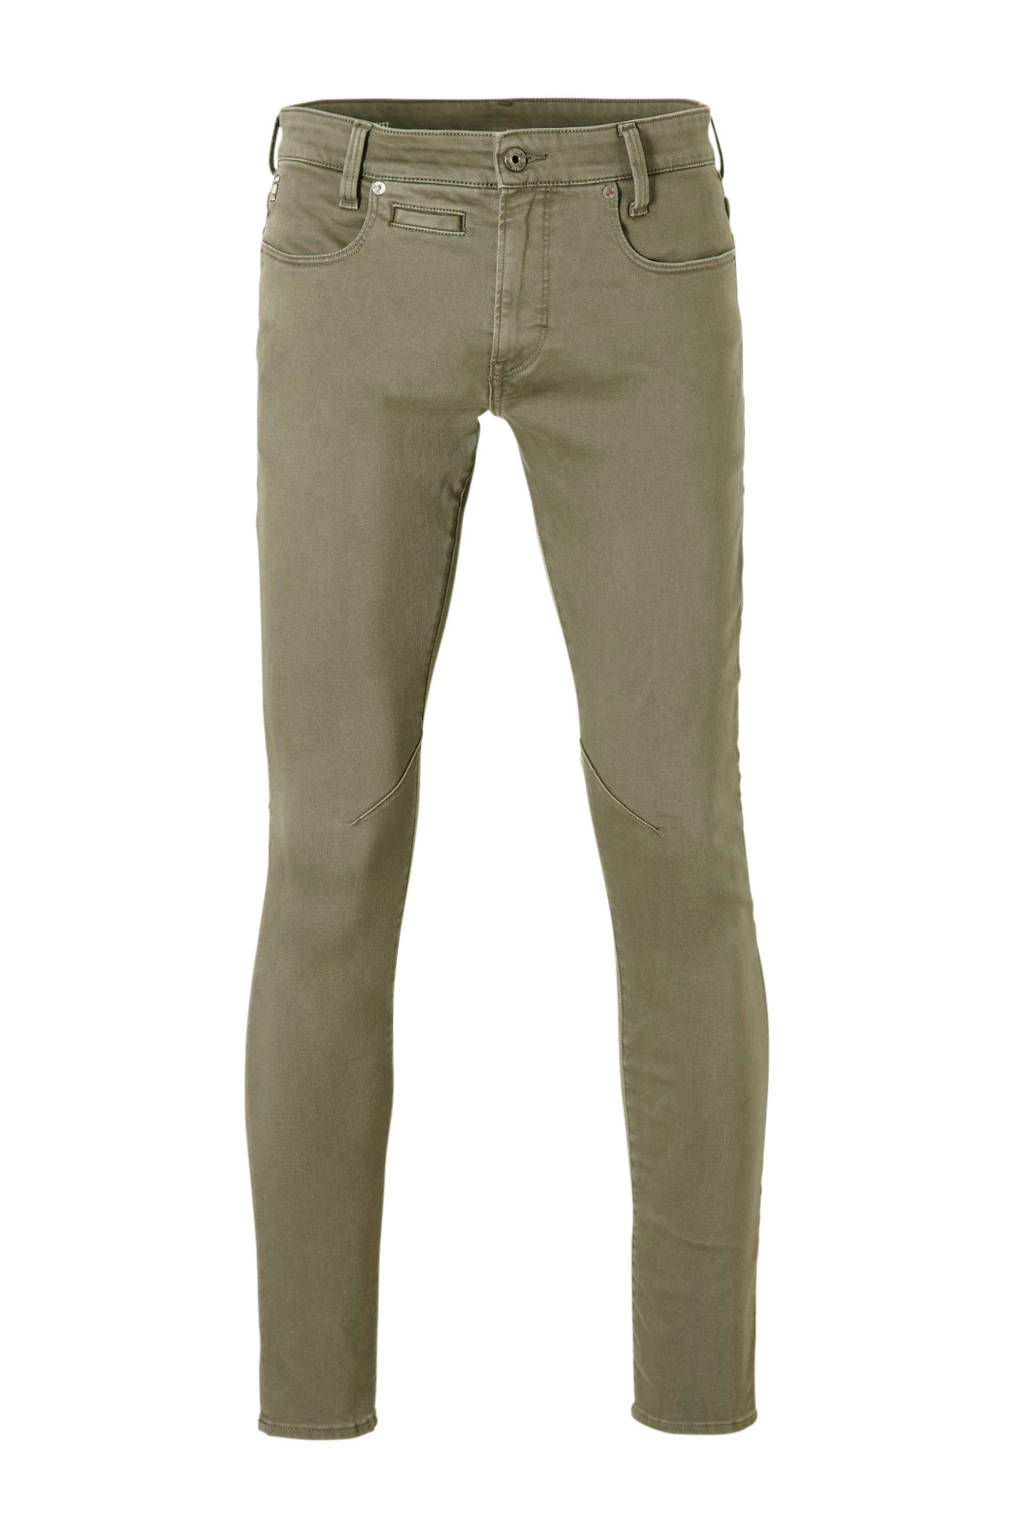 G-Star RAW D-Staq skinny jeans, Donkergroen